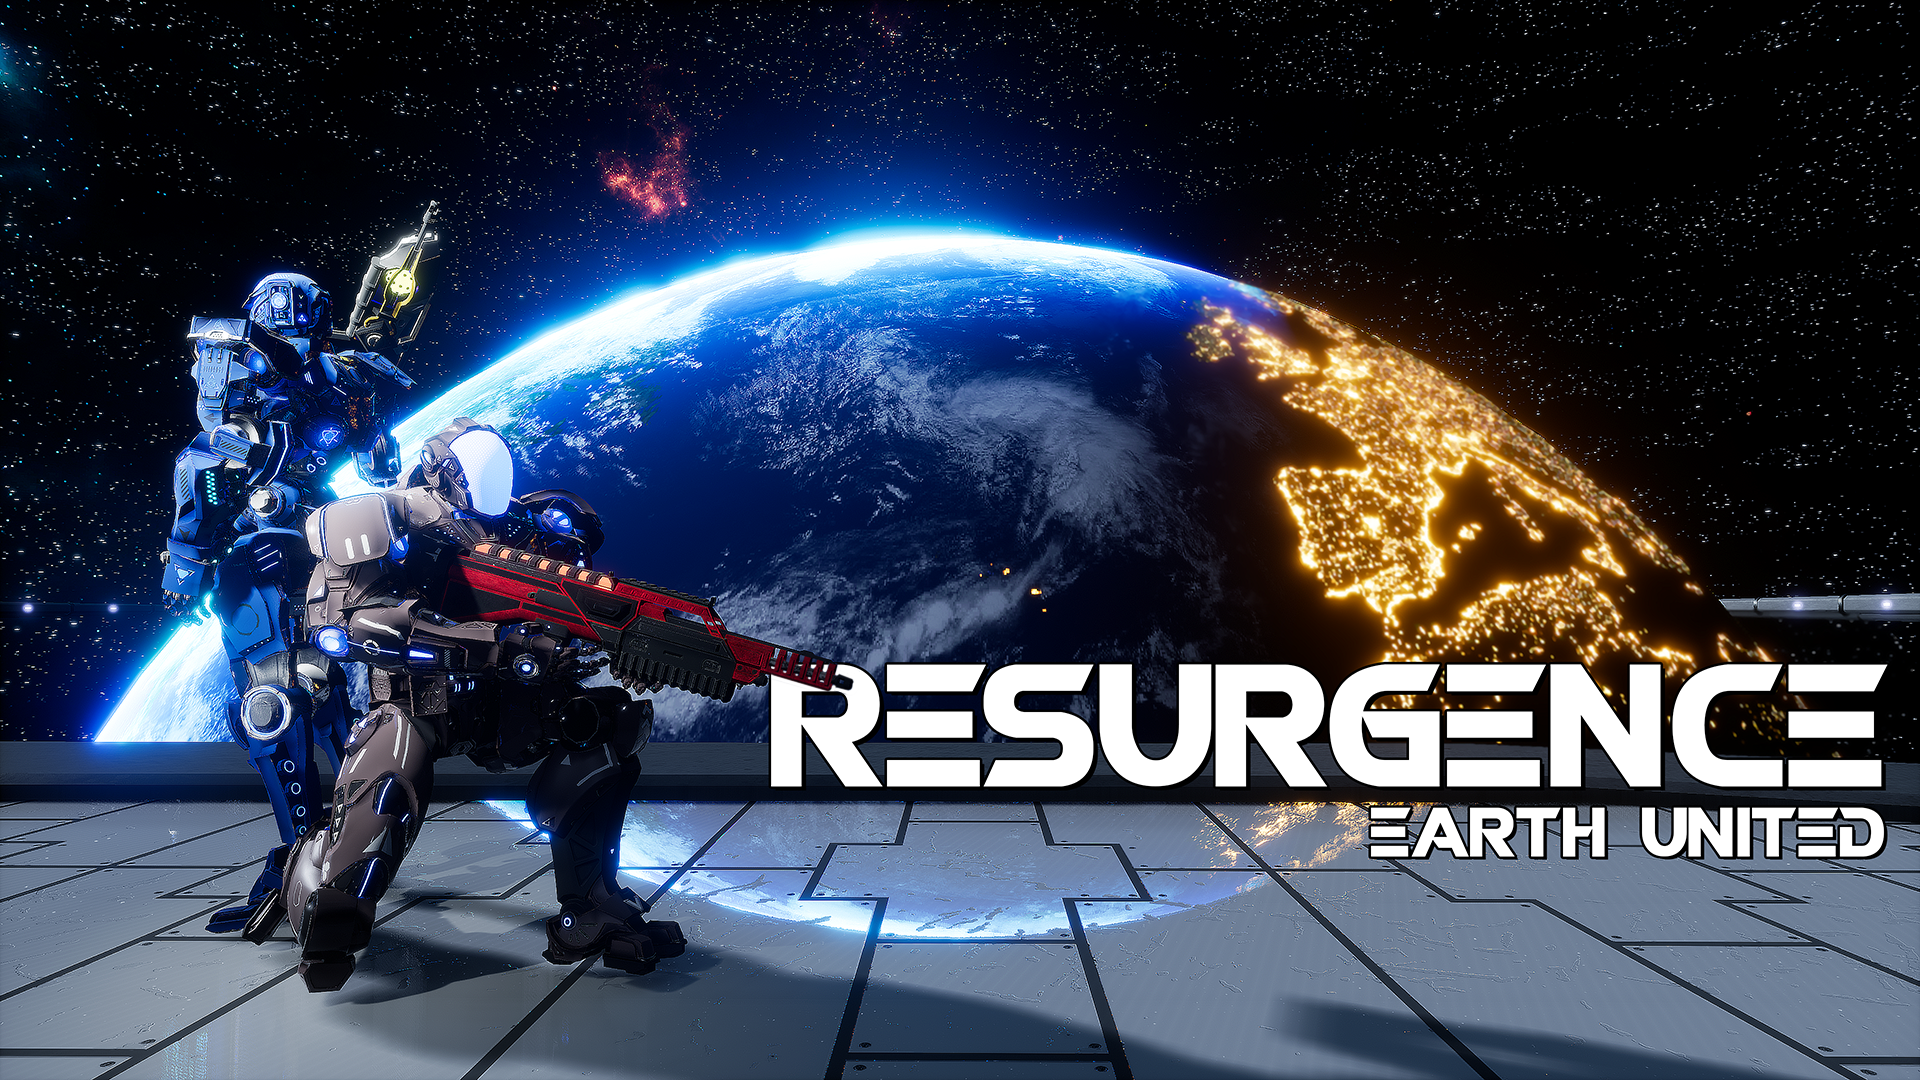 Resurgence Earth United Earth Promotional Image